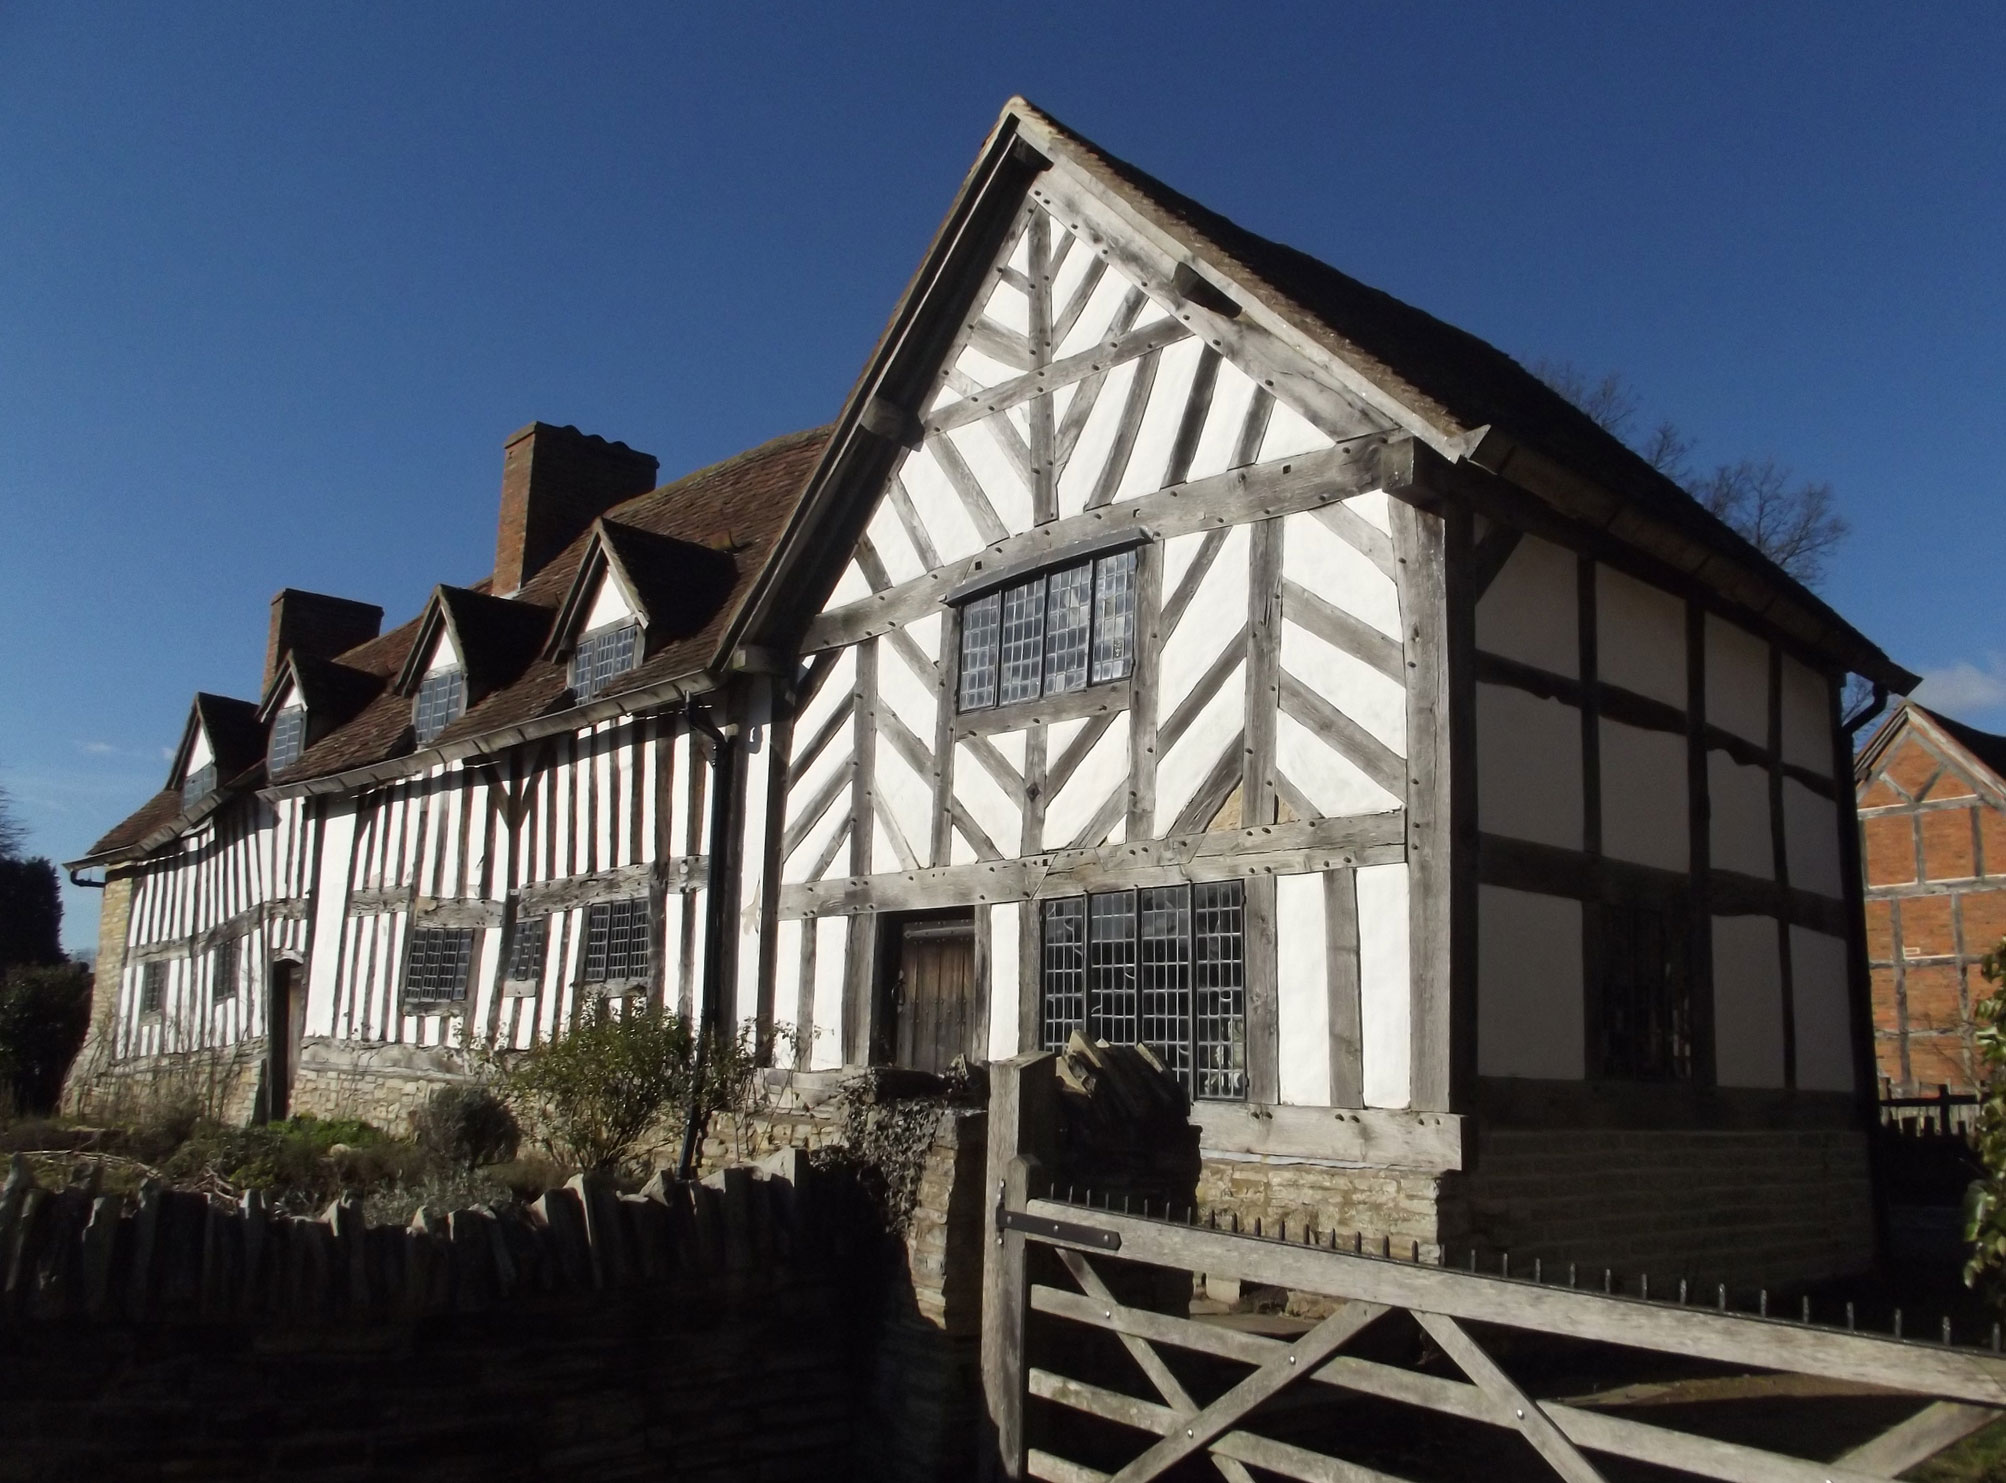 photograph of exterior of tudor building